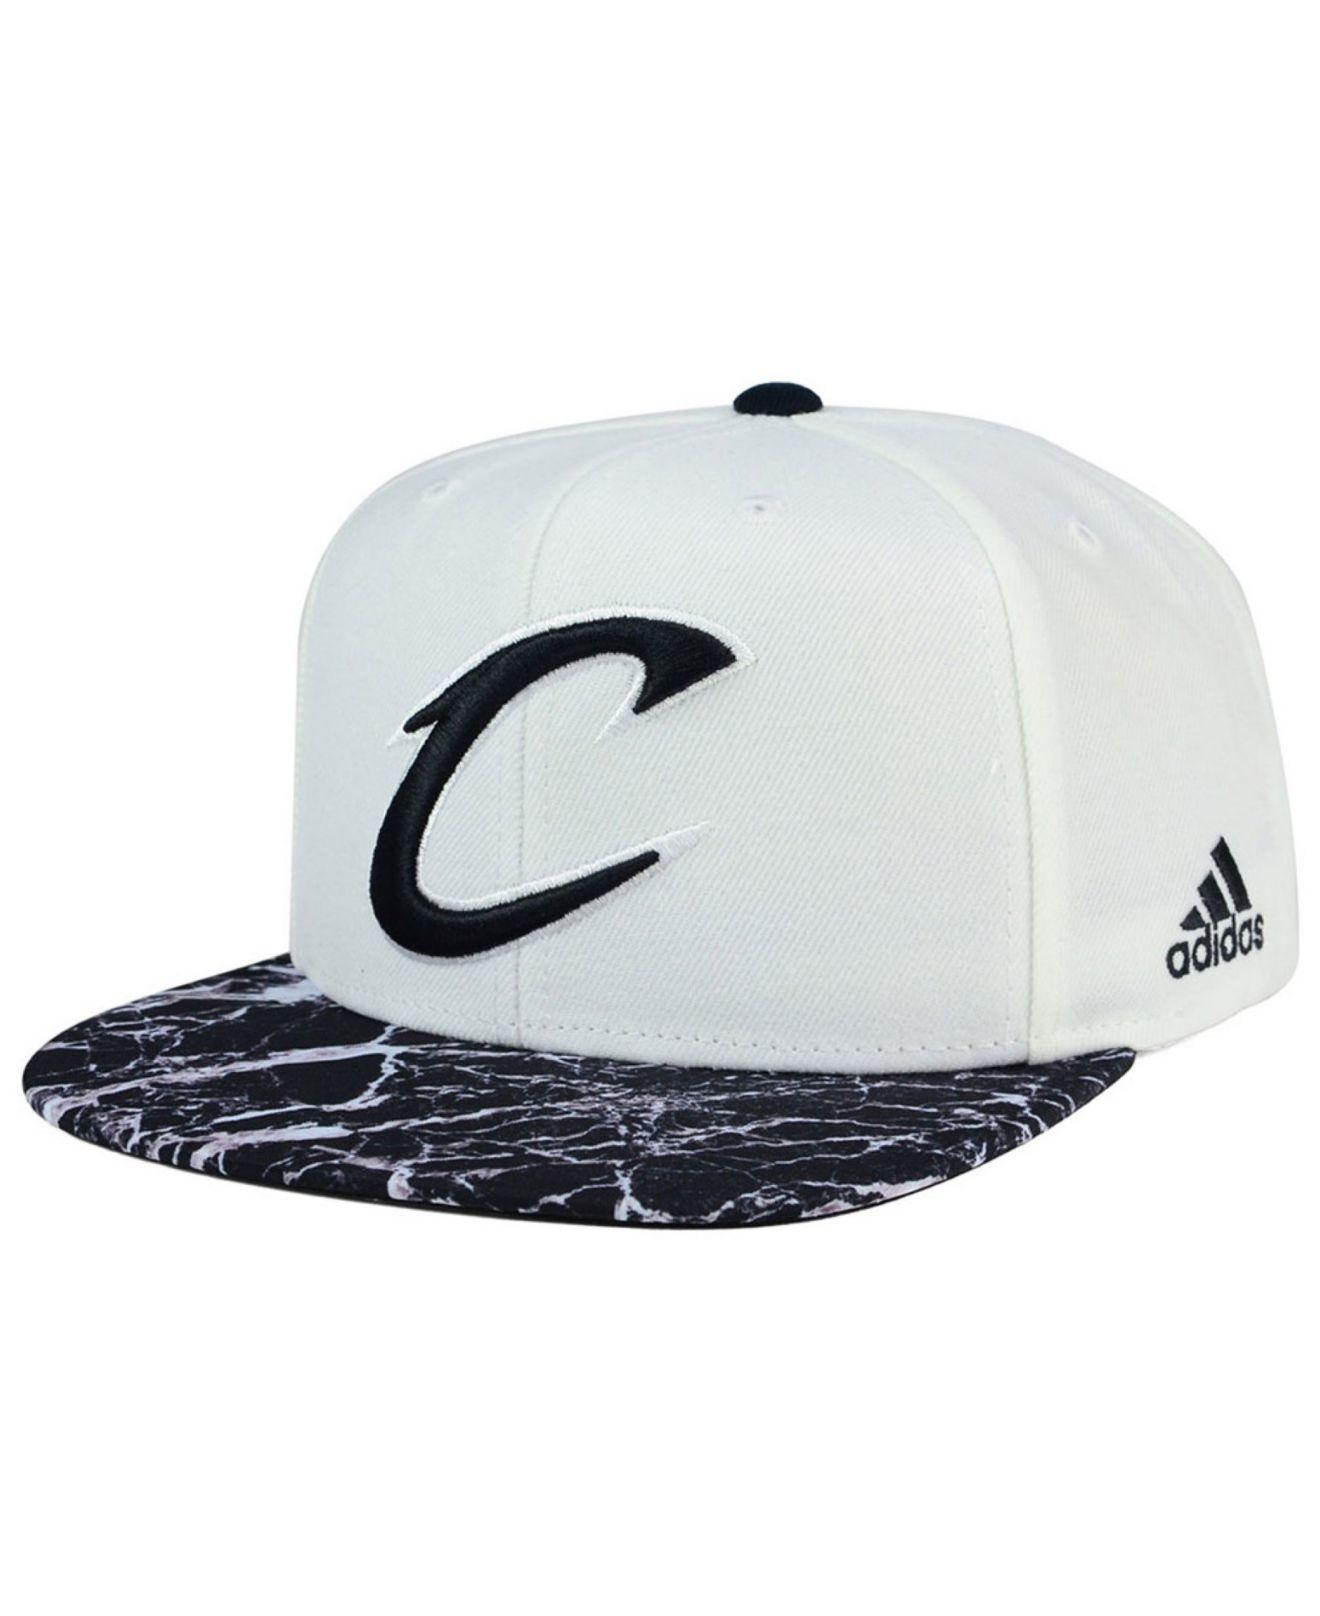 Lyst Adidas Originals Cleveland Cavaliers White Marble